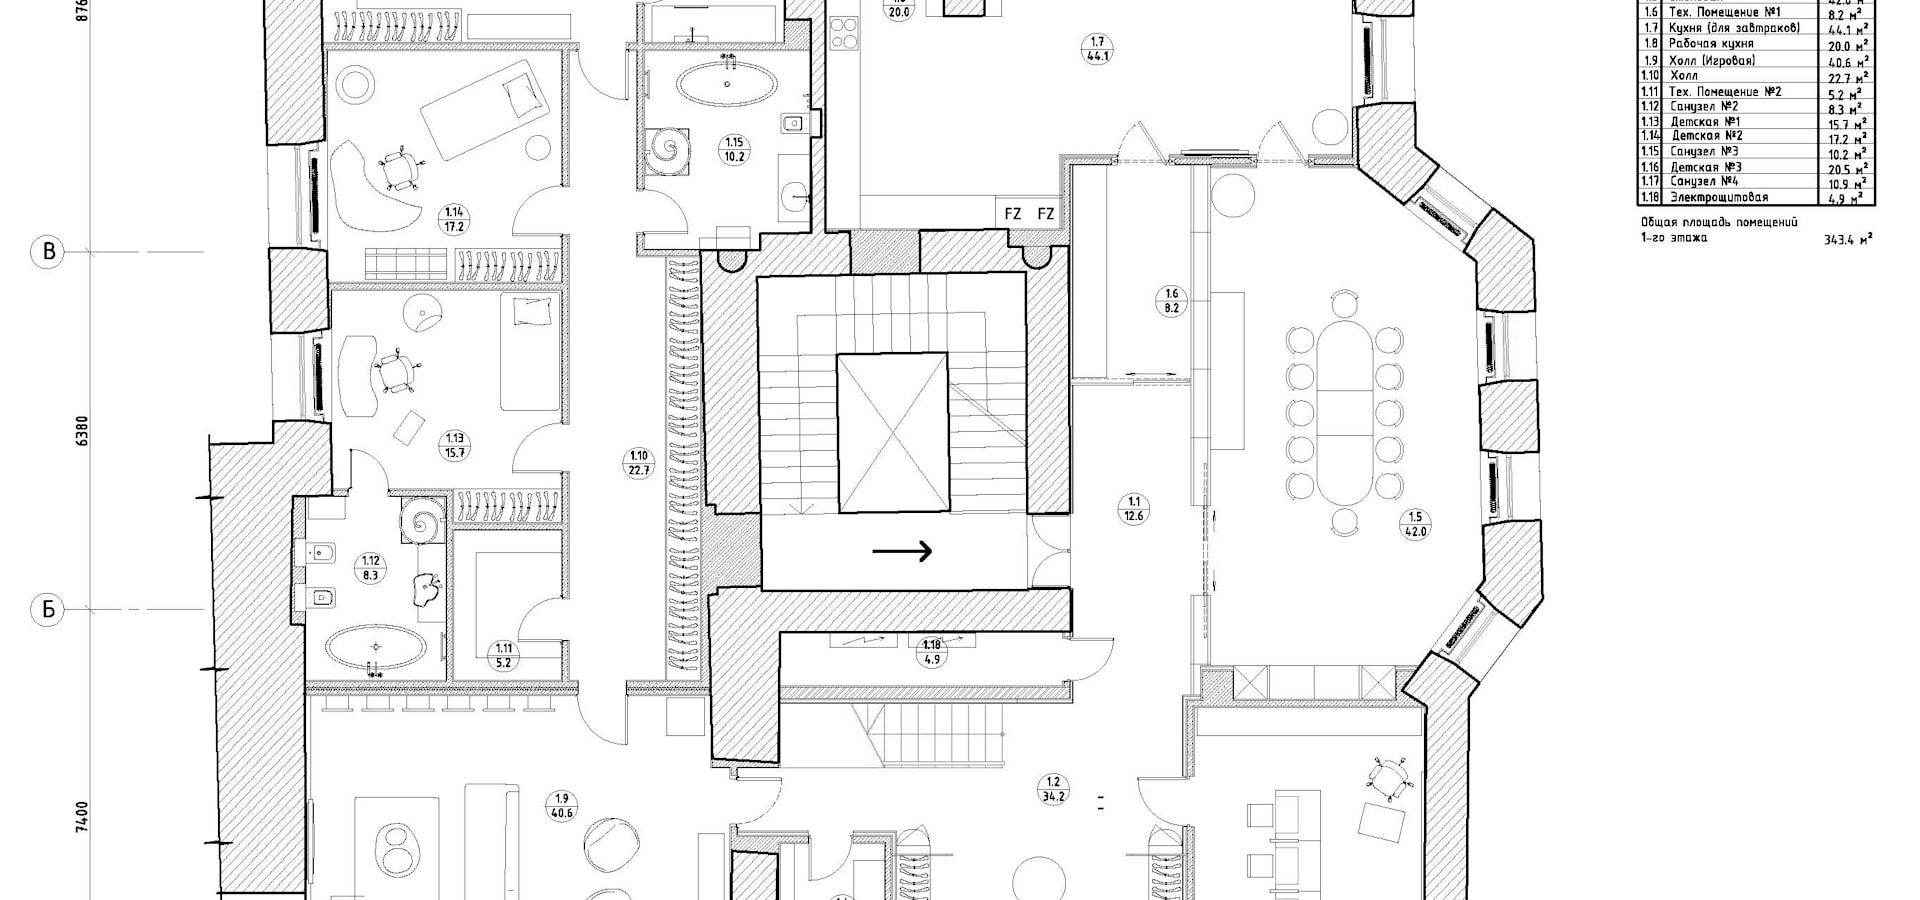 VOX Architects